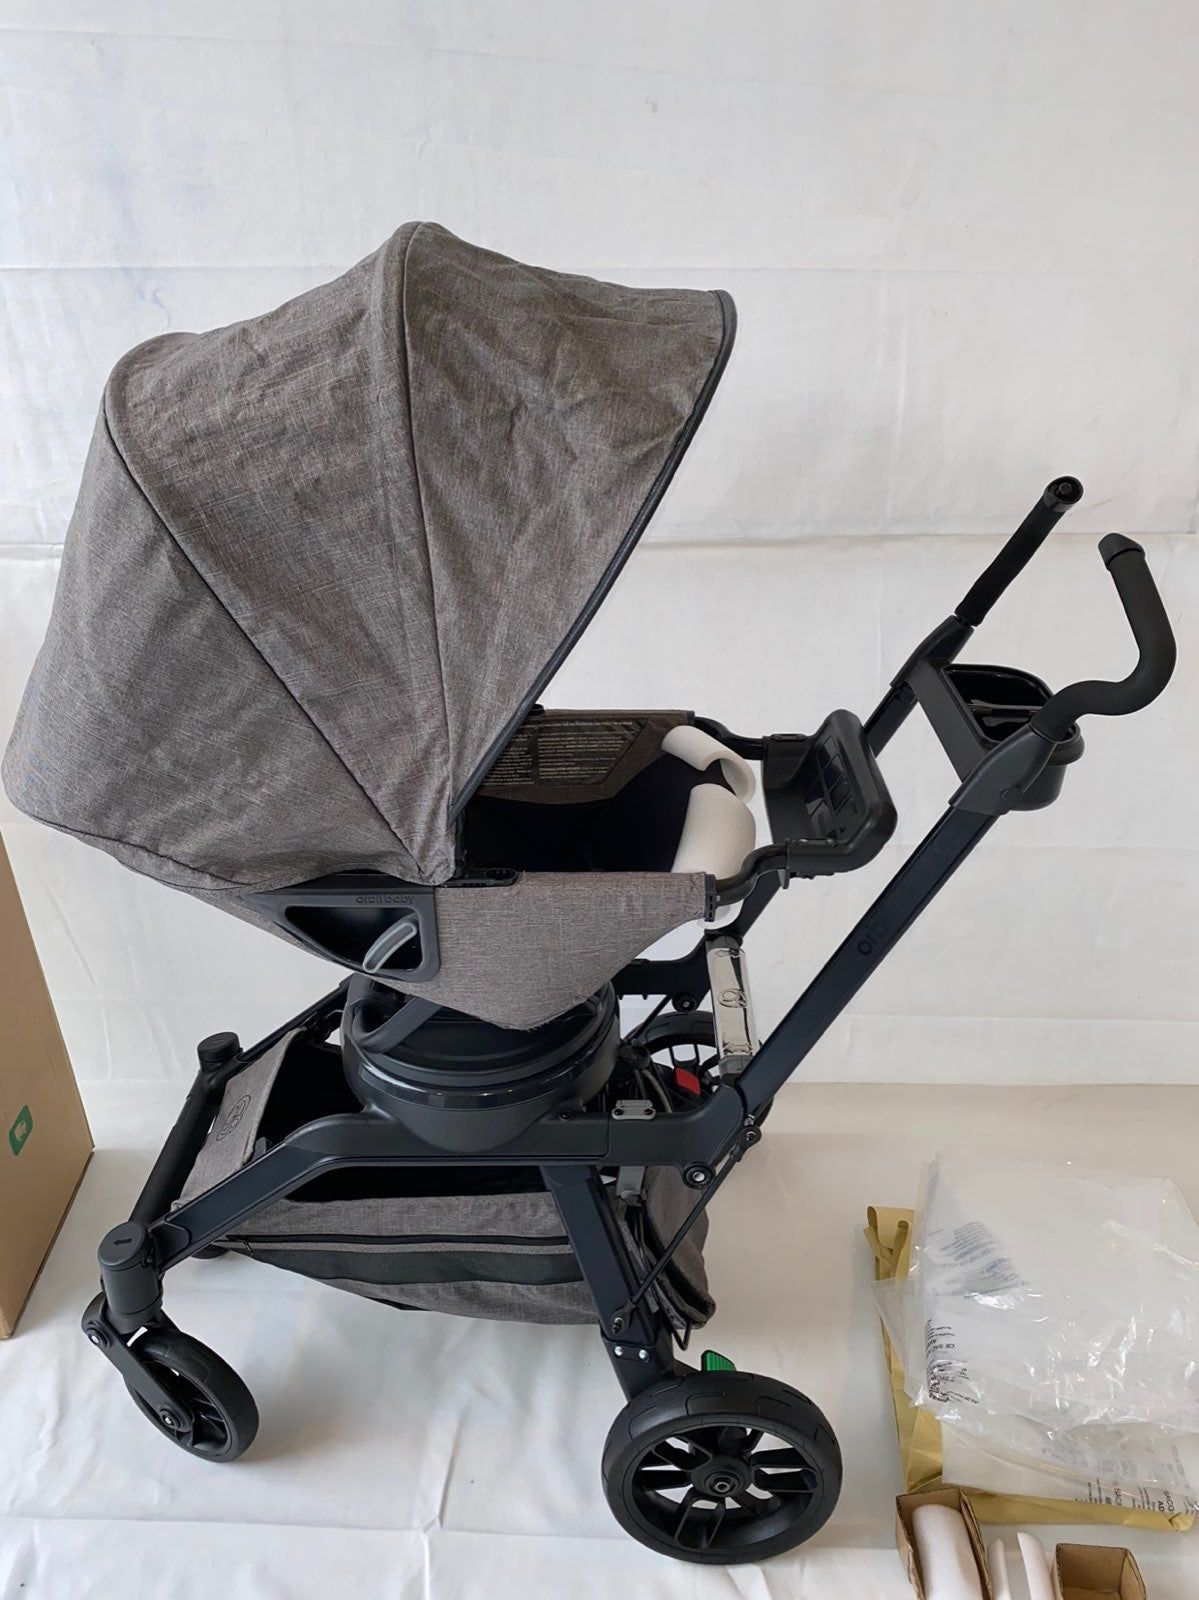 Orbit baby used Stroller frame Stroller seat Cargo basket